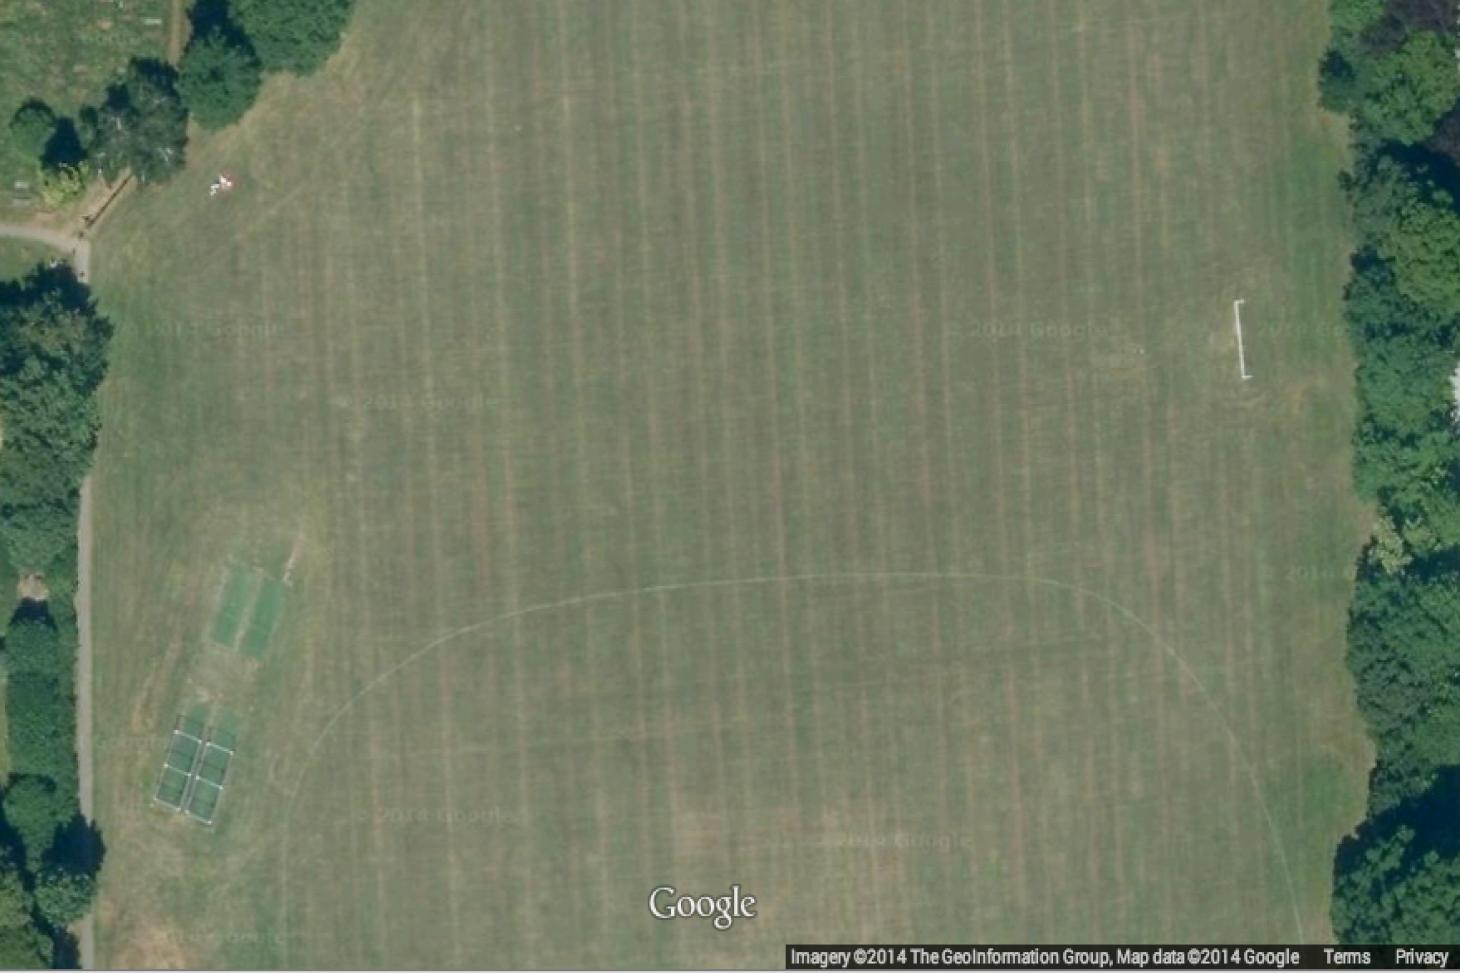 Cudham Recreation Ground 11 a side | Grass football pitch